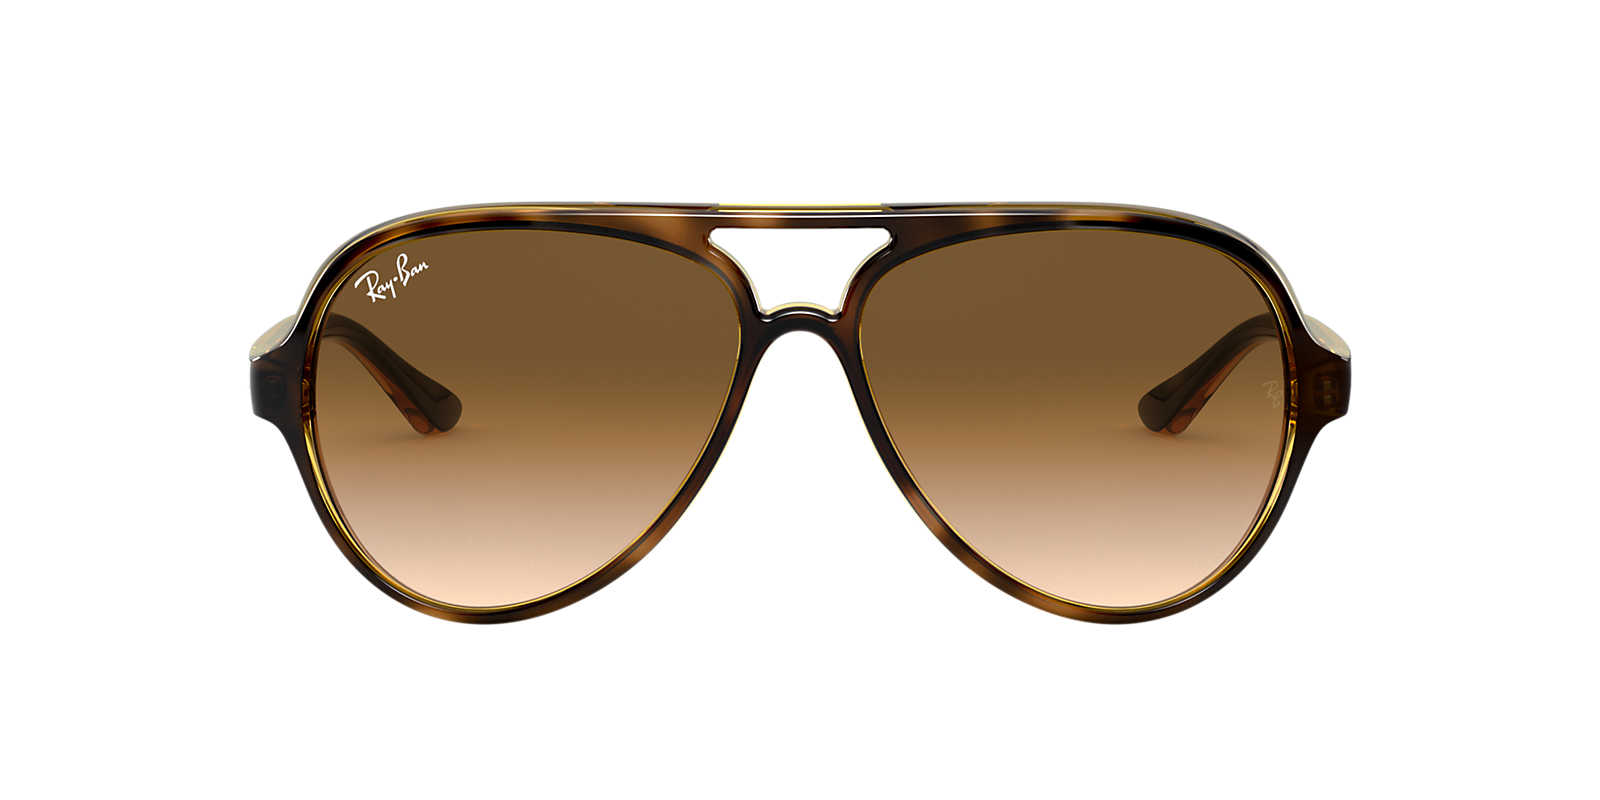 image: ray ban sunglasses [24]